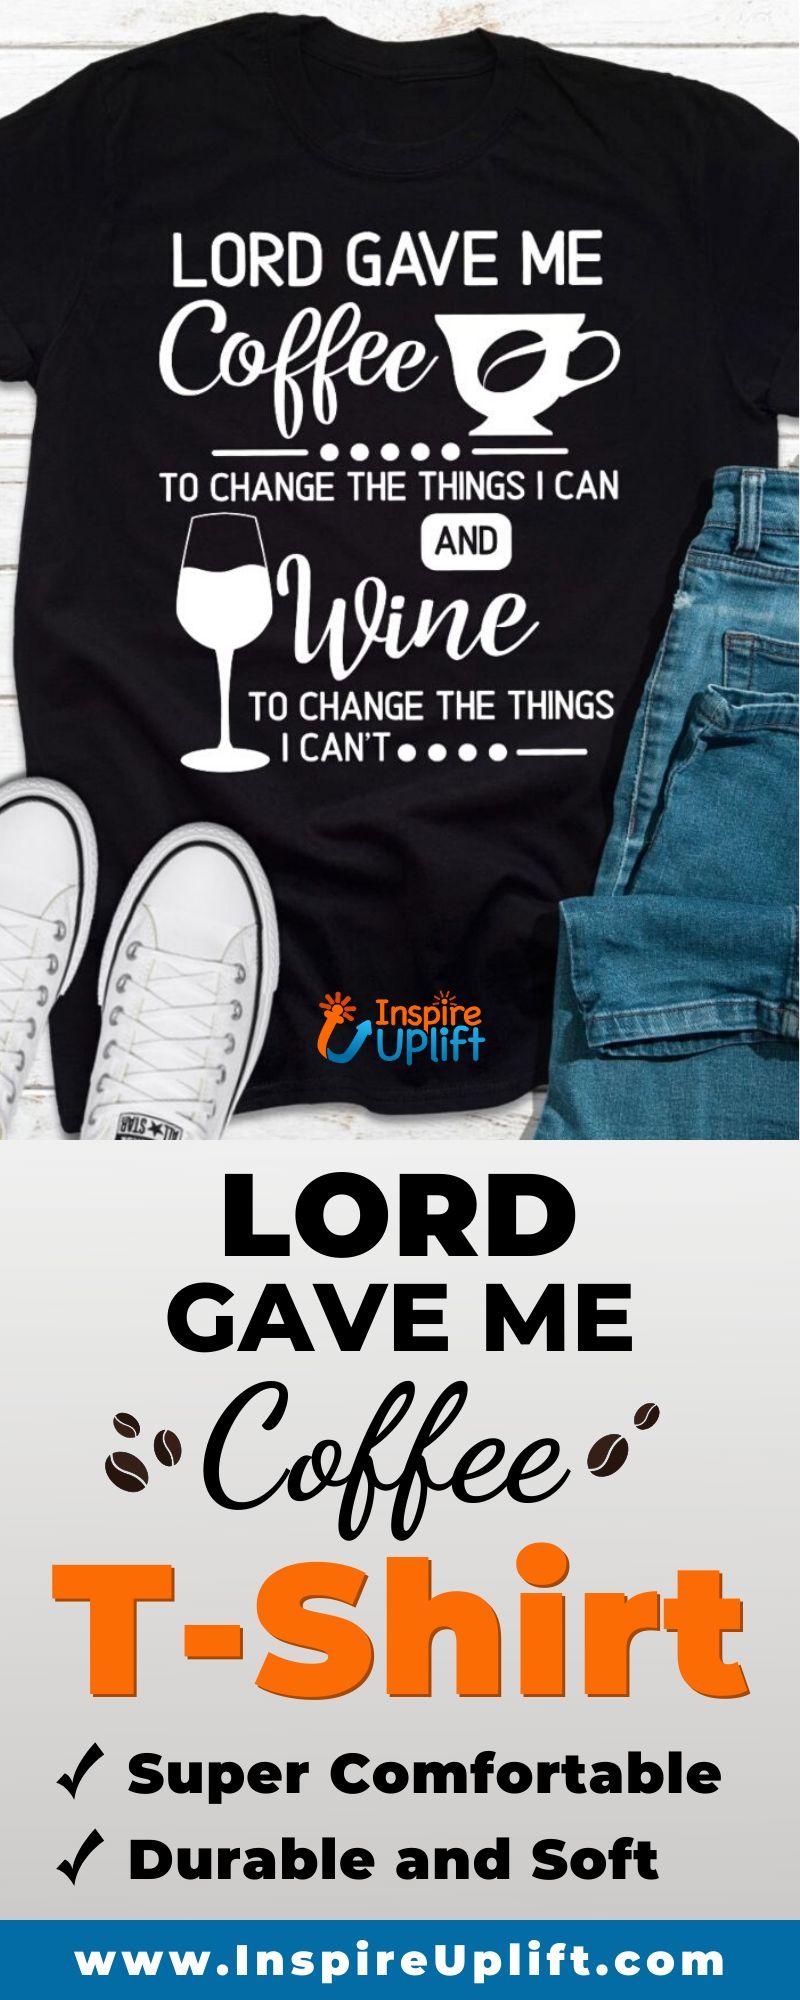 Lord Gave Me Coffee T-Shirt 😍 InspireUplift.com